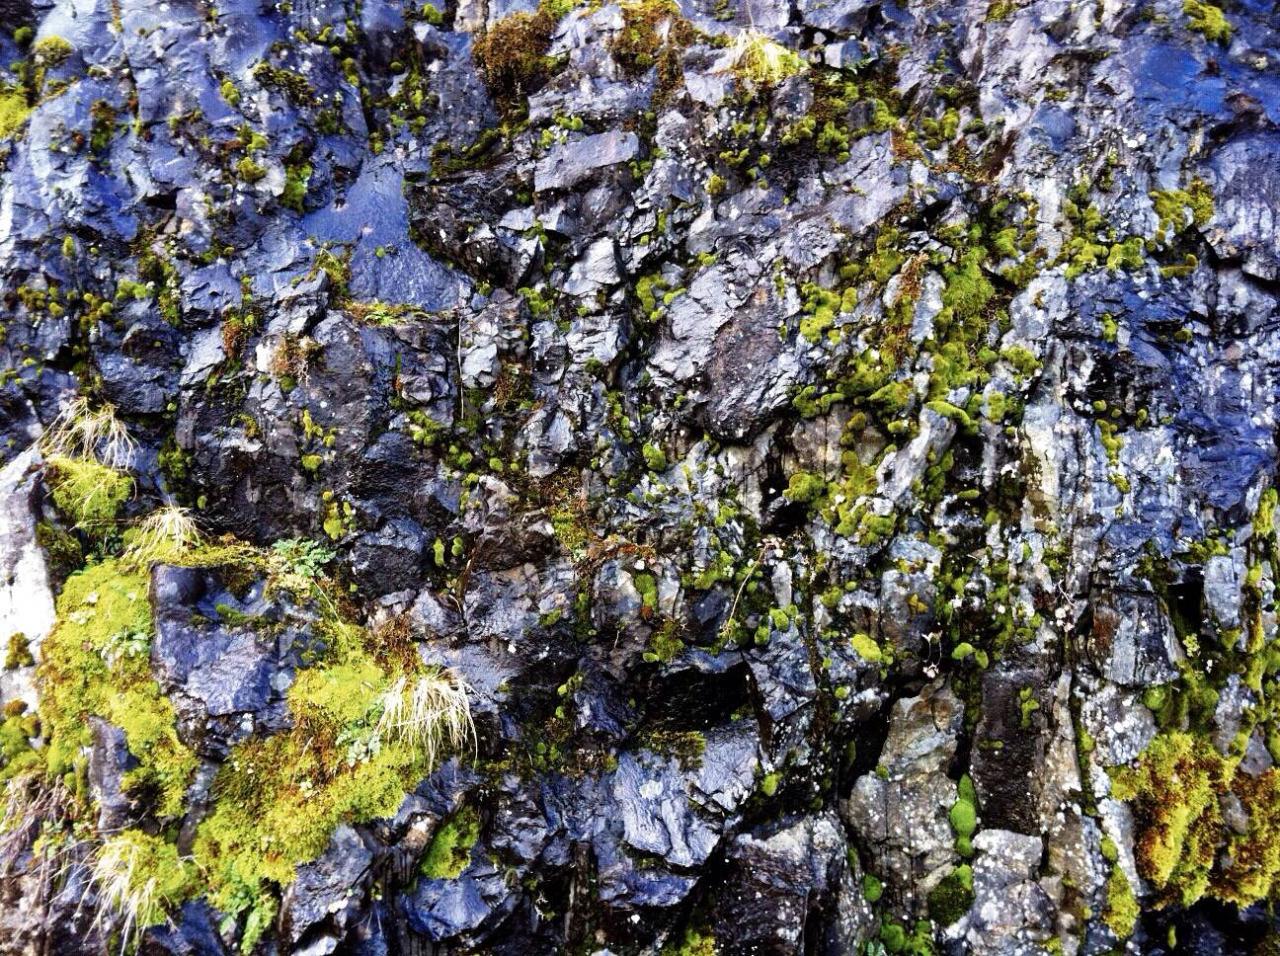 #Moss #EasternOregon